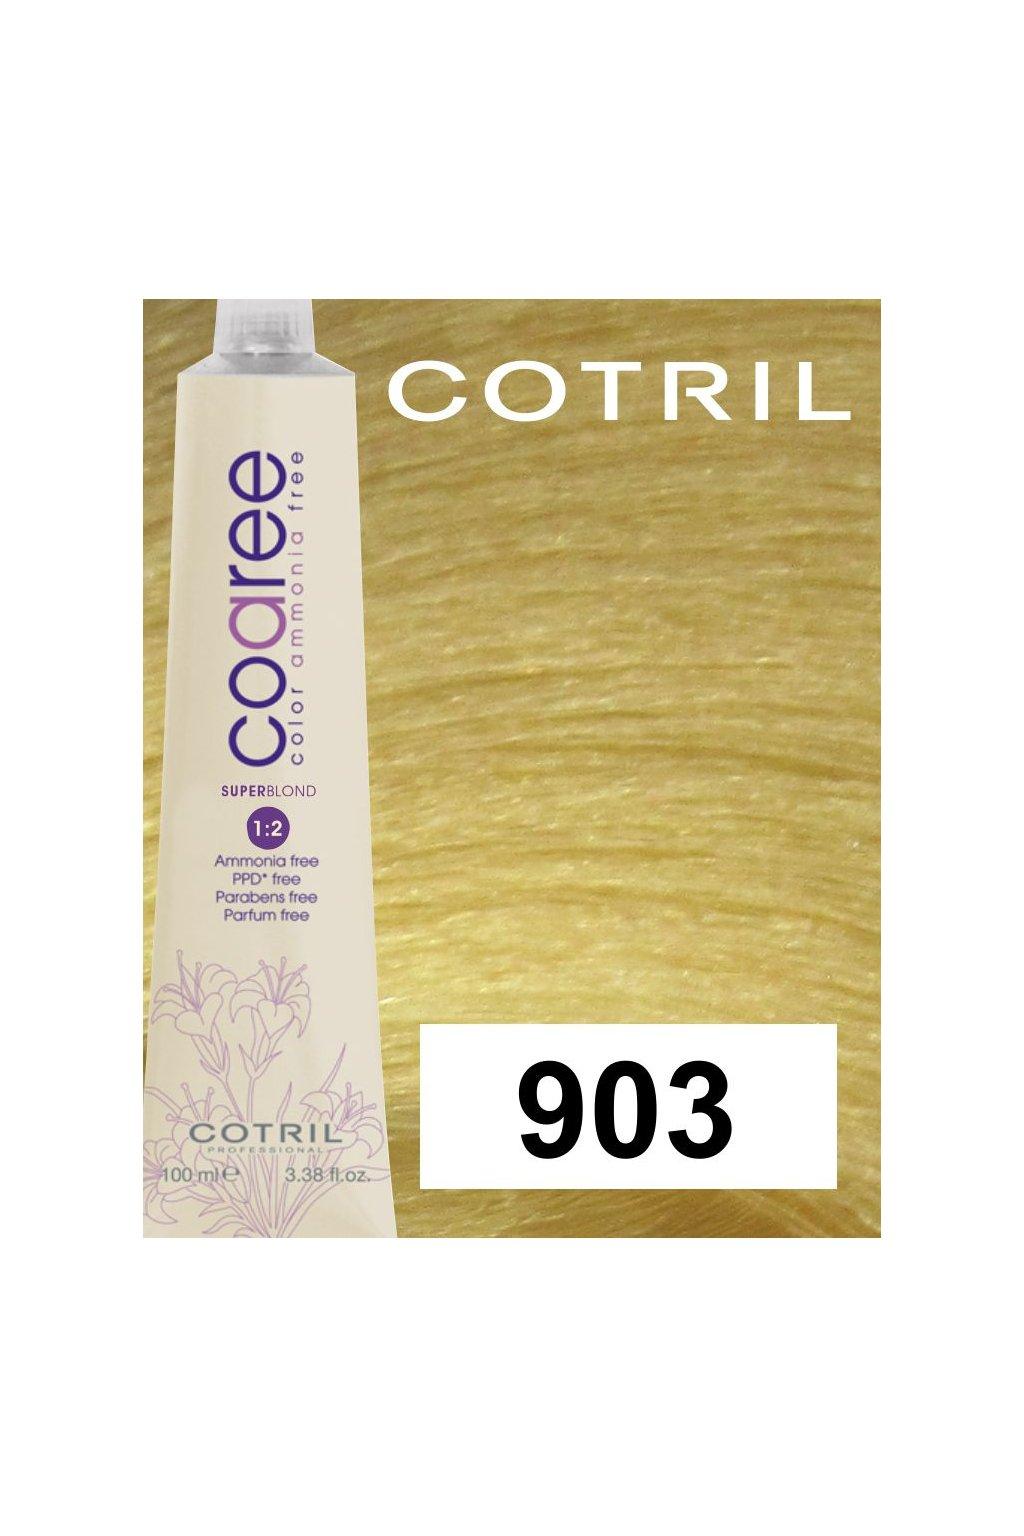 903 coaree